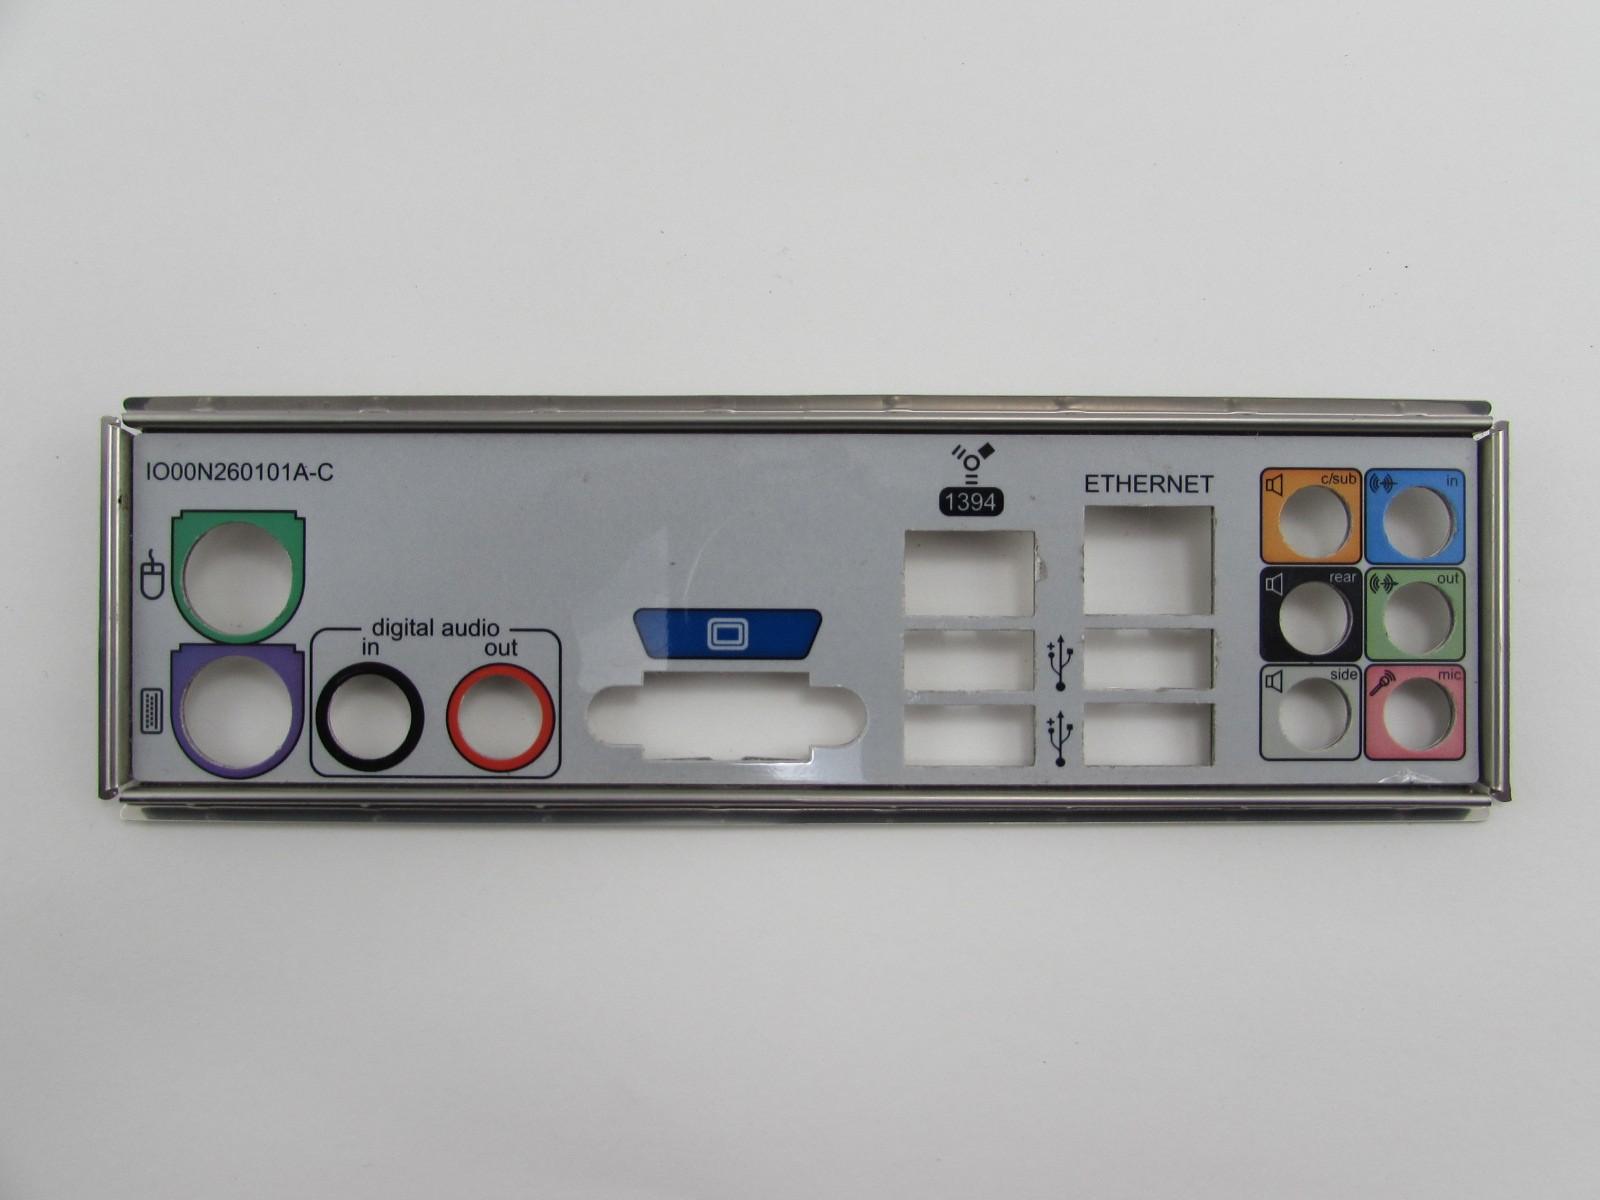 P5lp-le leonite motherboard